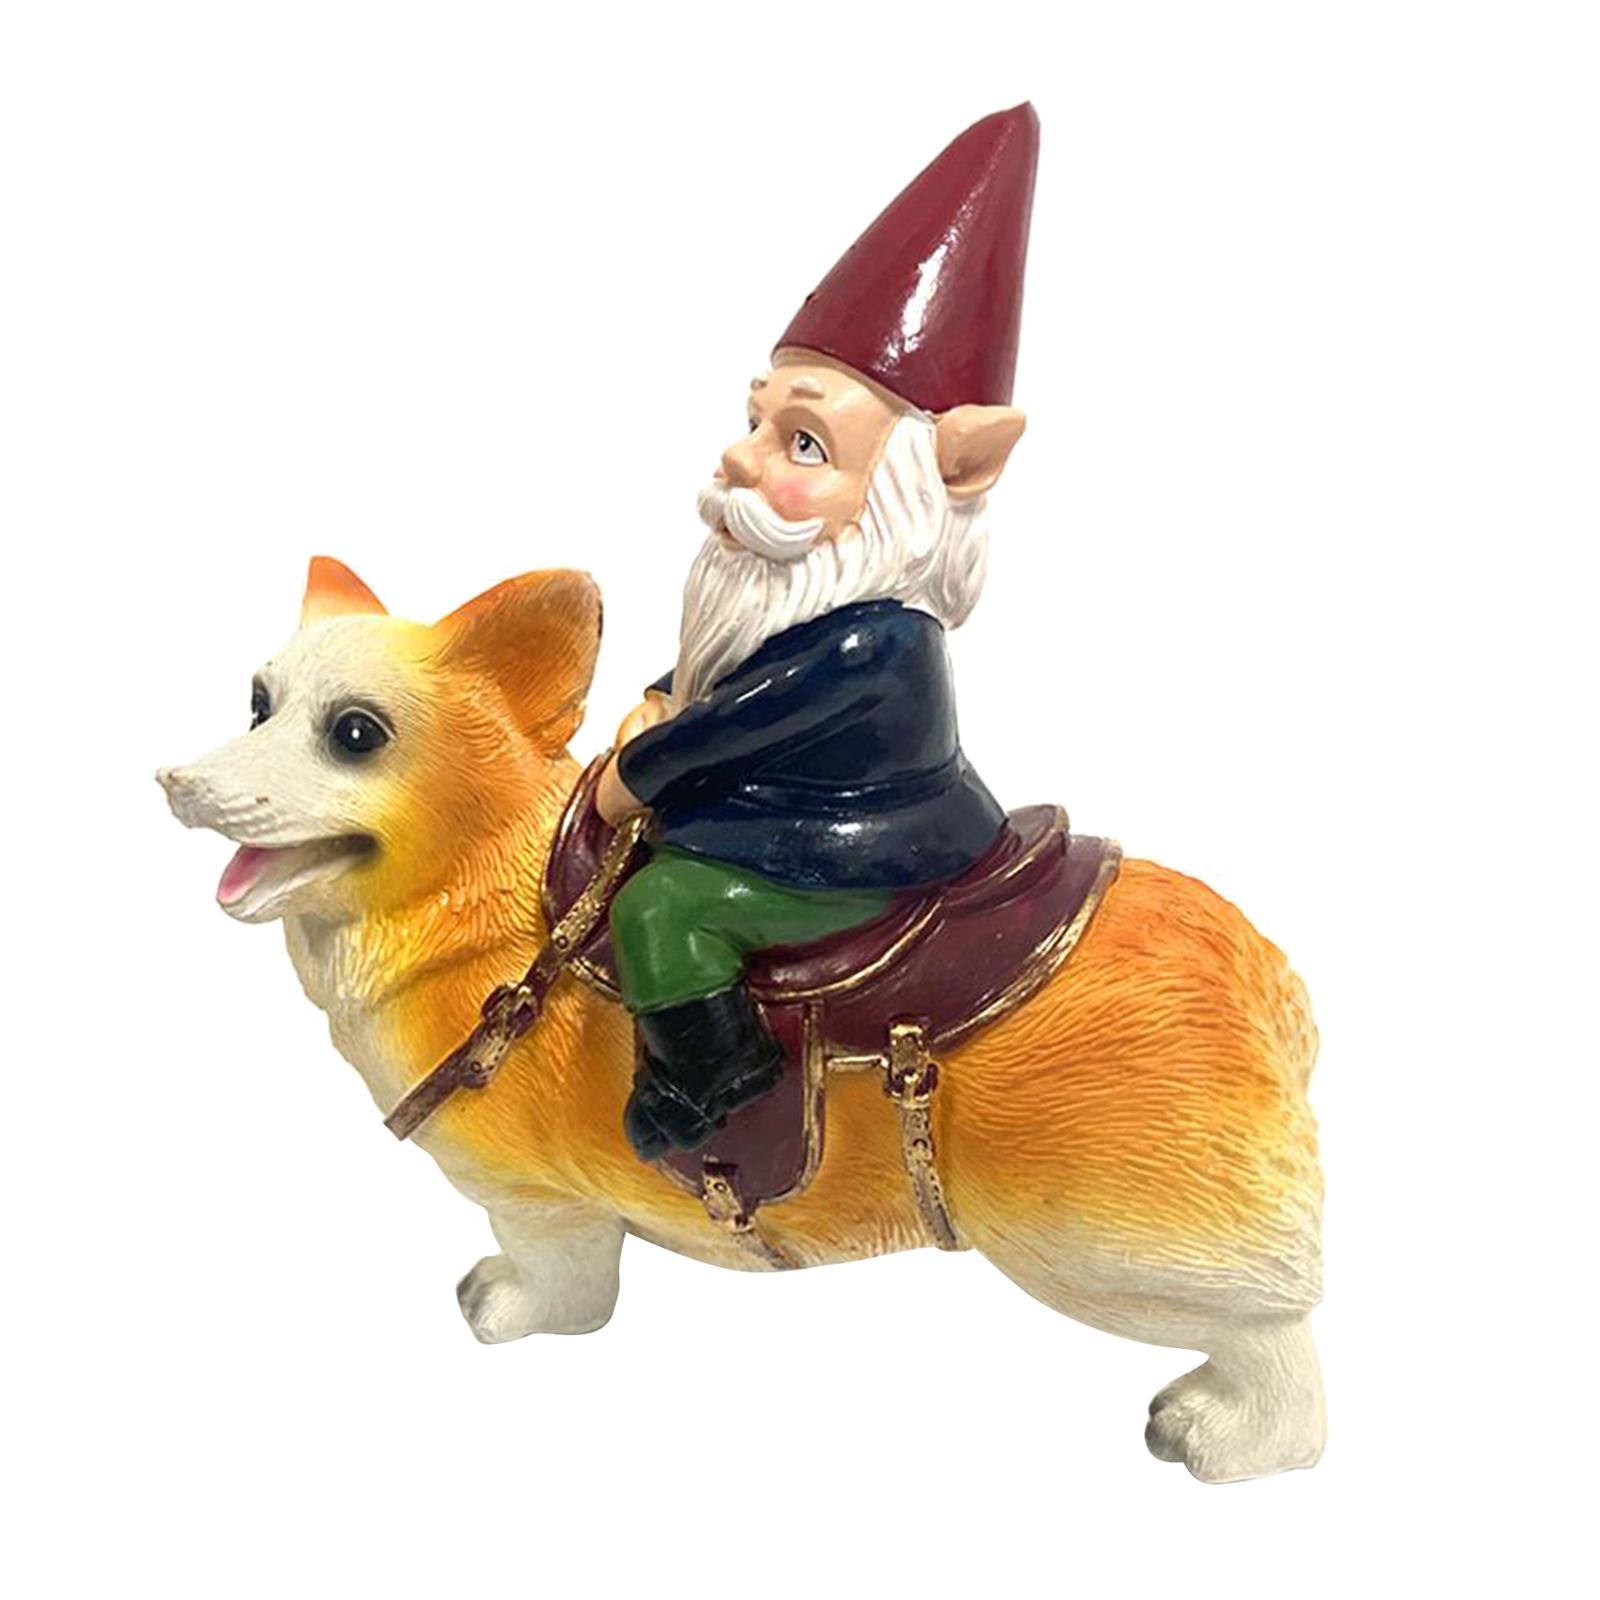 thumbnail 30 - Funny Resin Naughty Garden Gnome Statue Ornaments Villa Home Figurines Decor AU